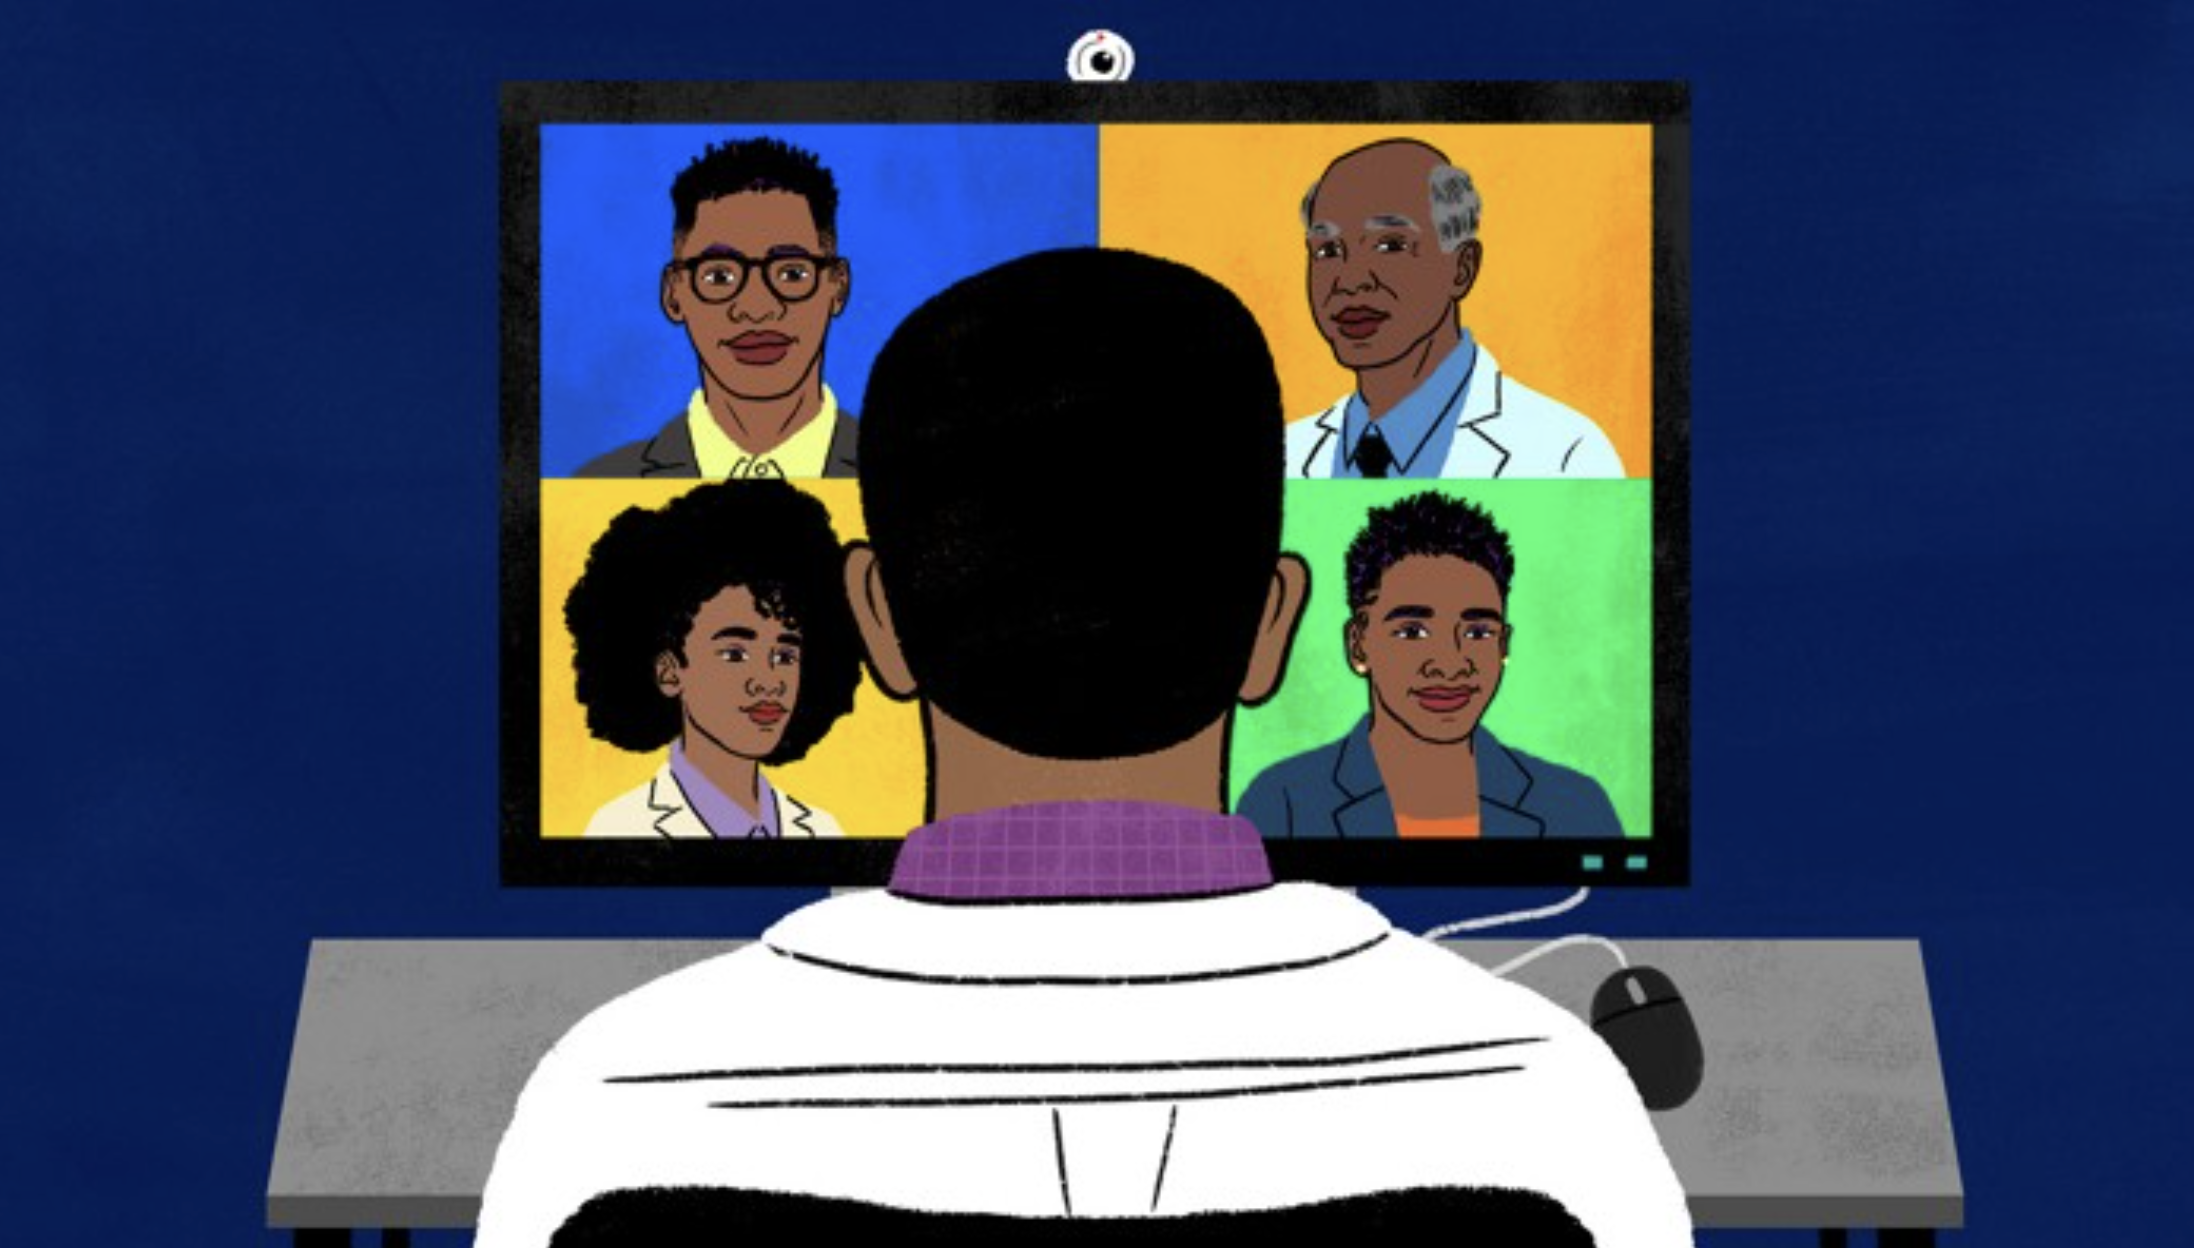 Black chemists online